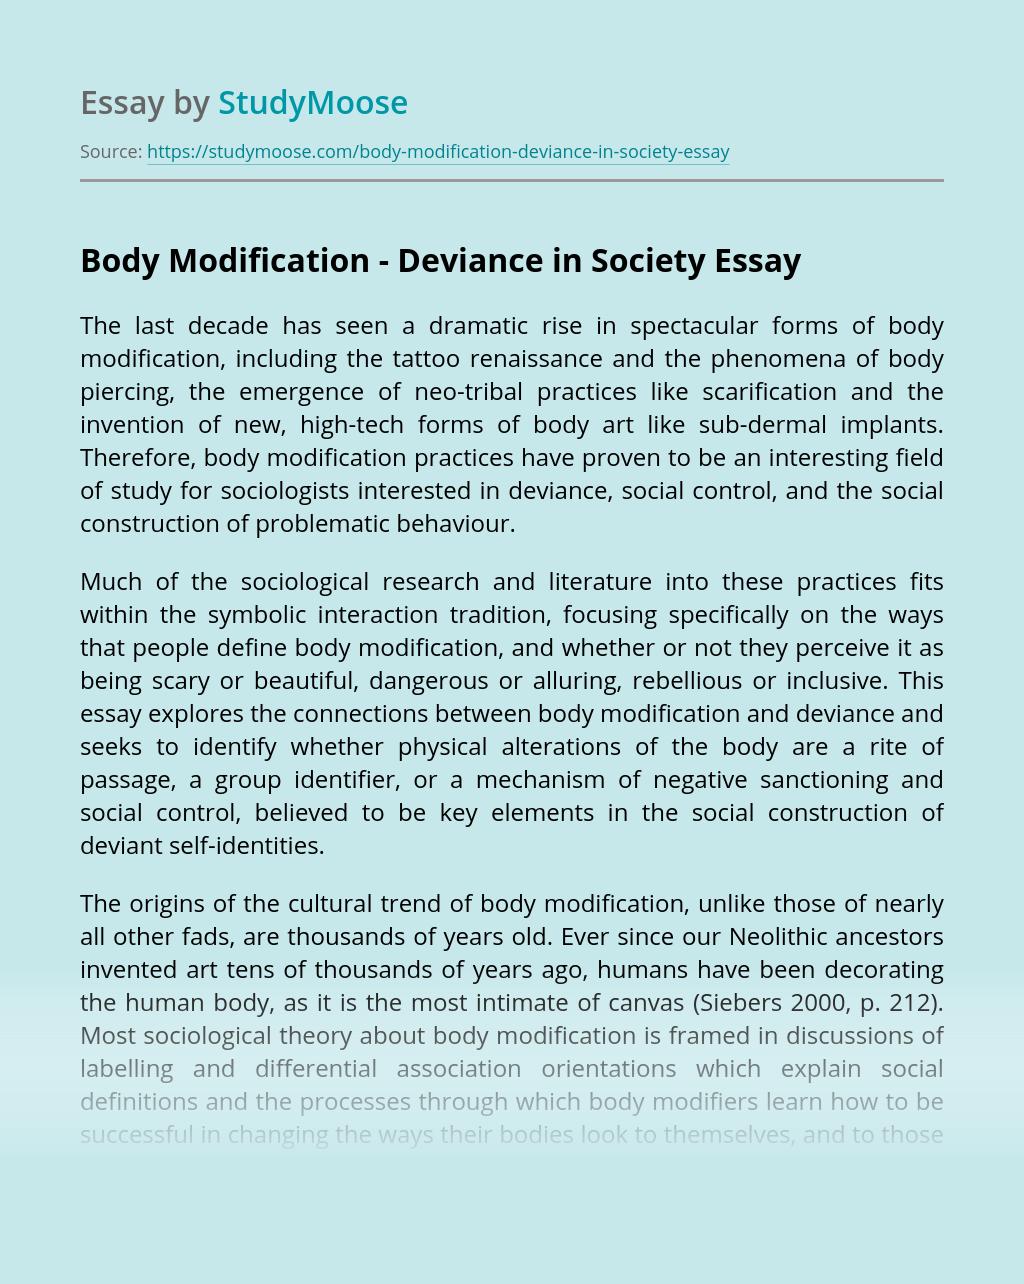 Body Modification – Deviance in Society